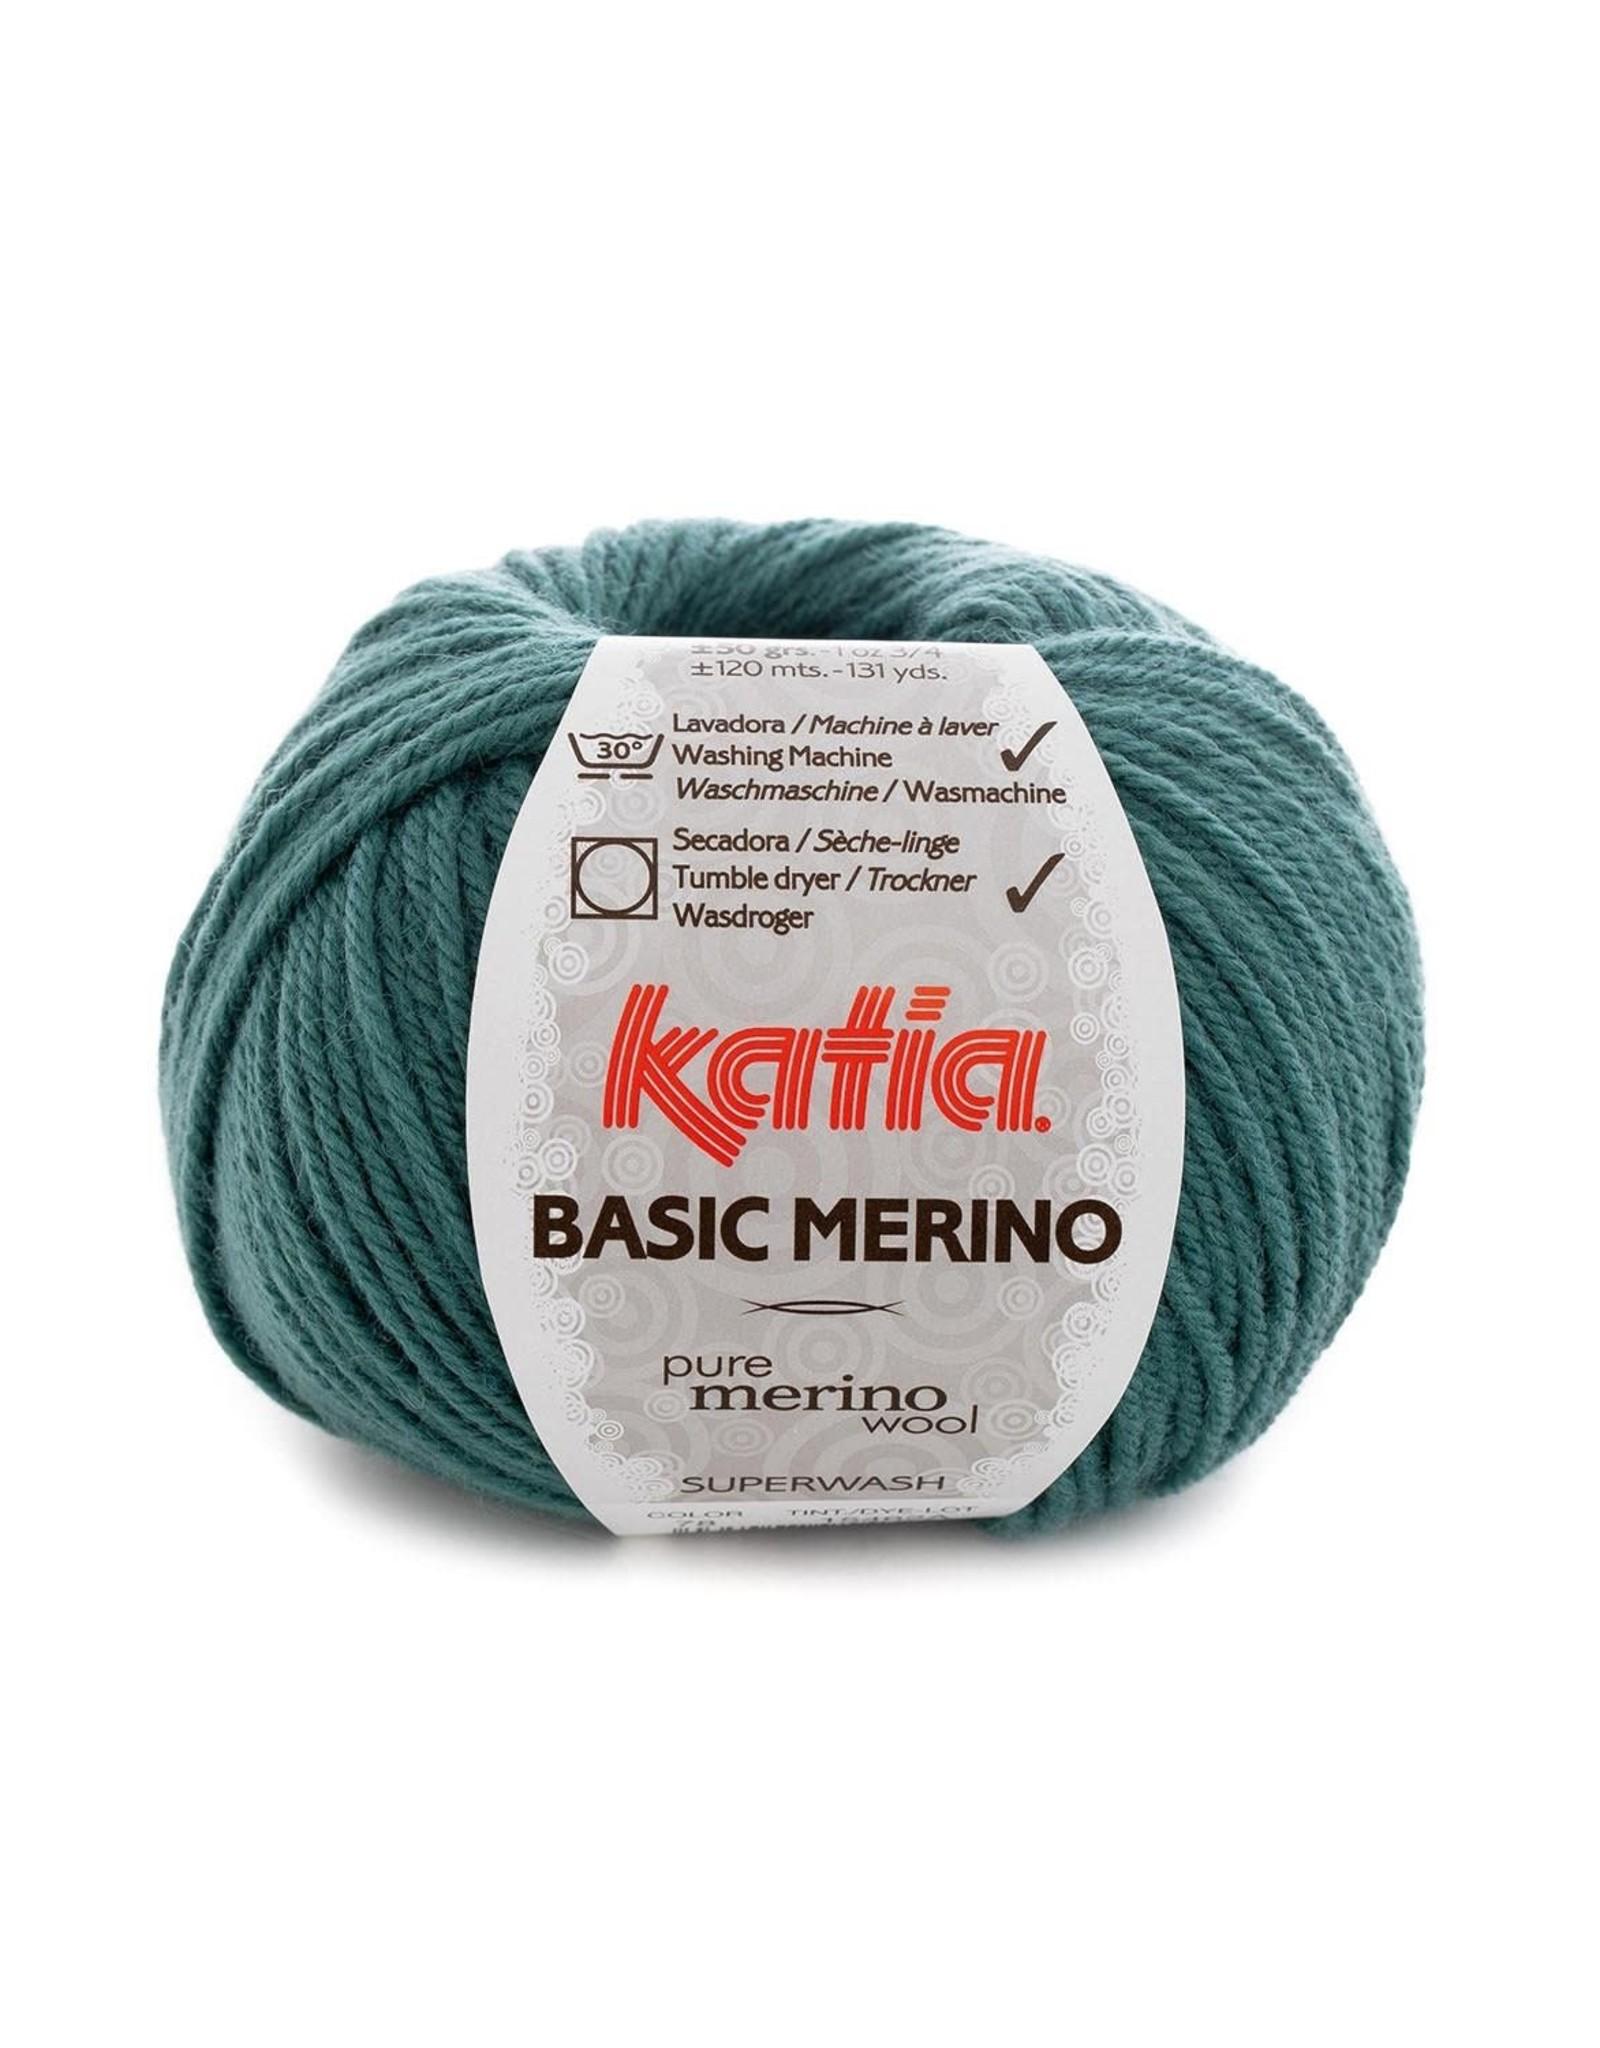 Katia Katia Basic Merino 78 - Smaragdgroen